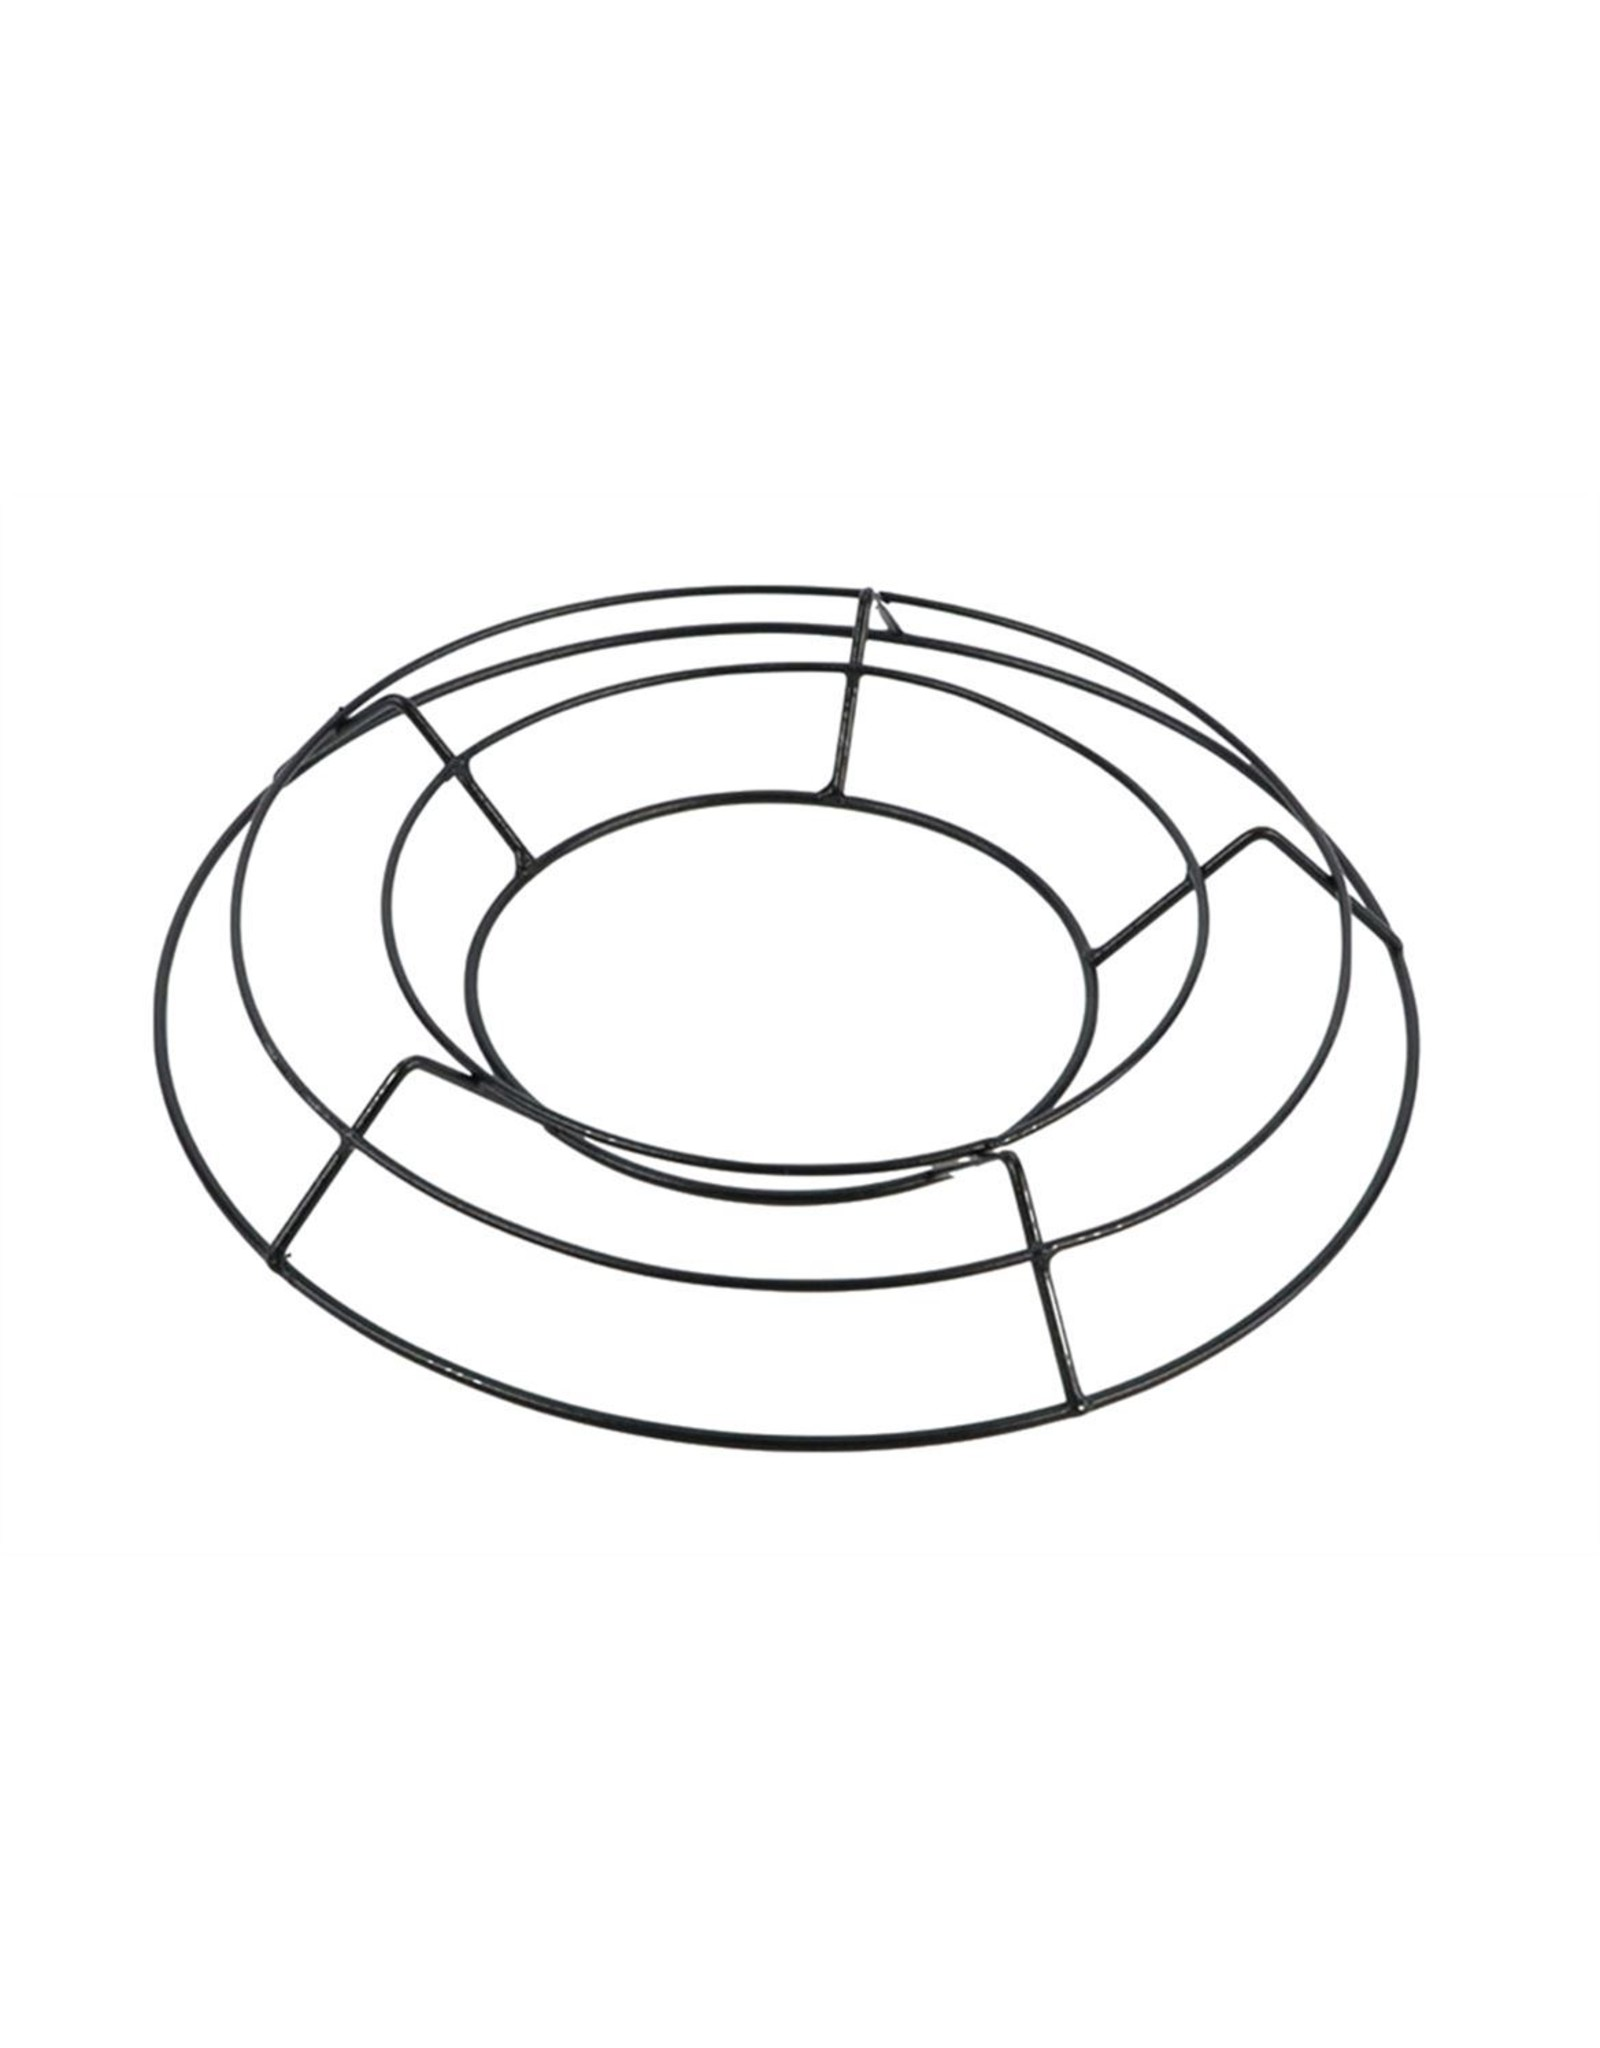 HD Basic Ring Floral D30.0h3.0 x 35